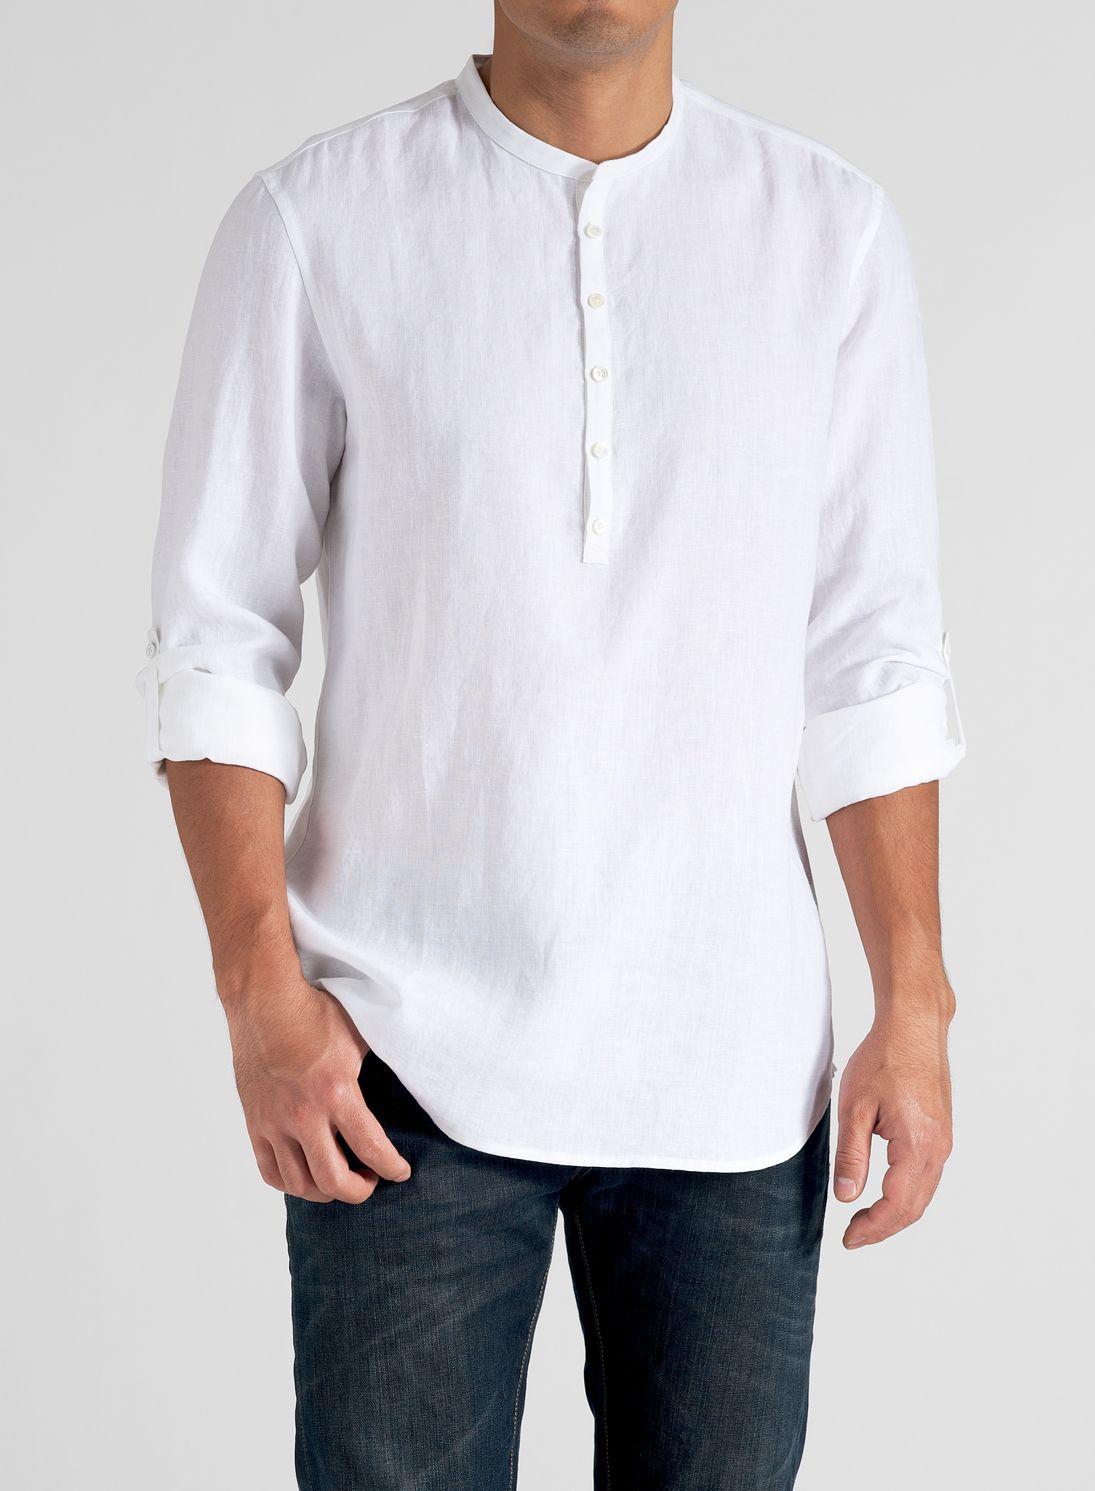 Men Clothing Linen Men Roll Up Sleeve Shirt Clothing